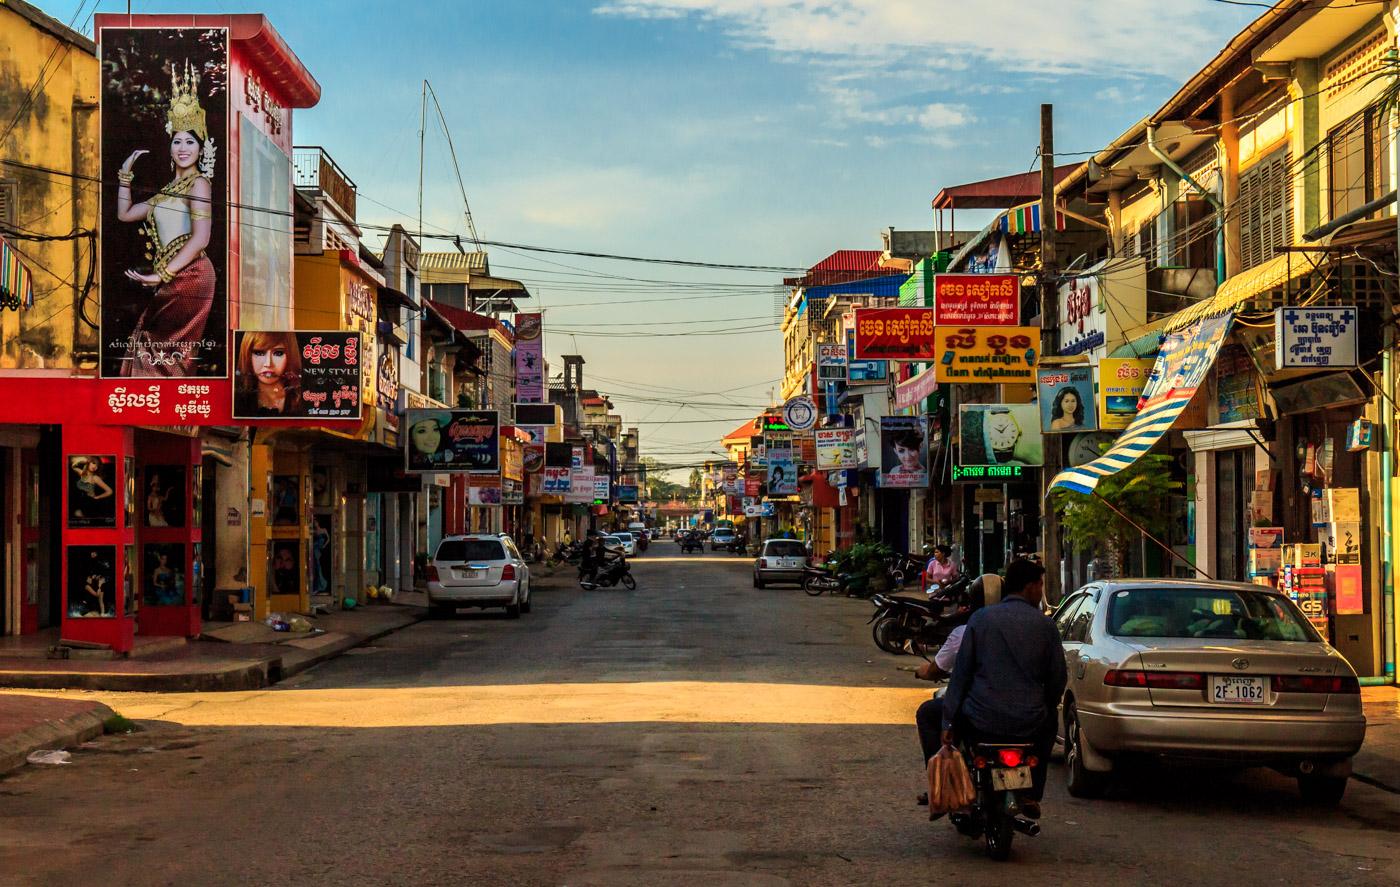 Photography studio street in Battambang.